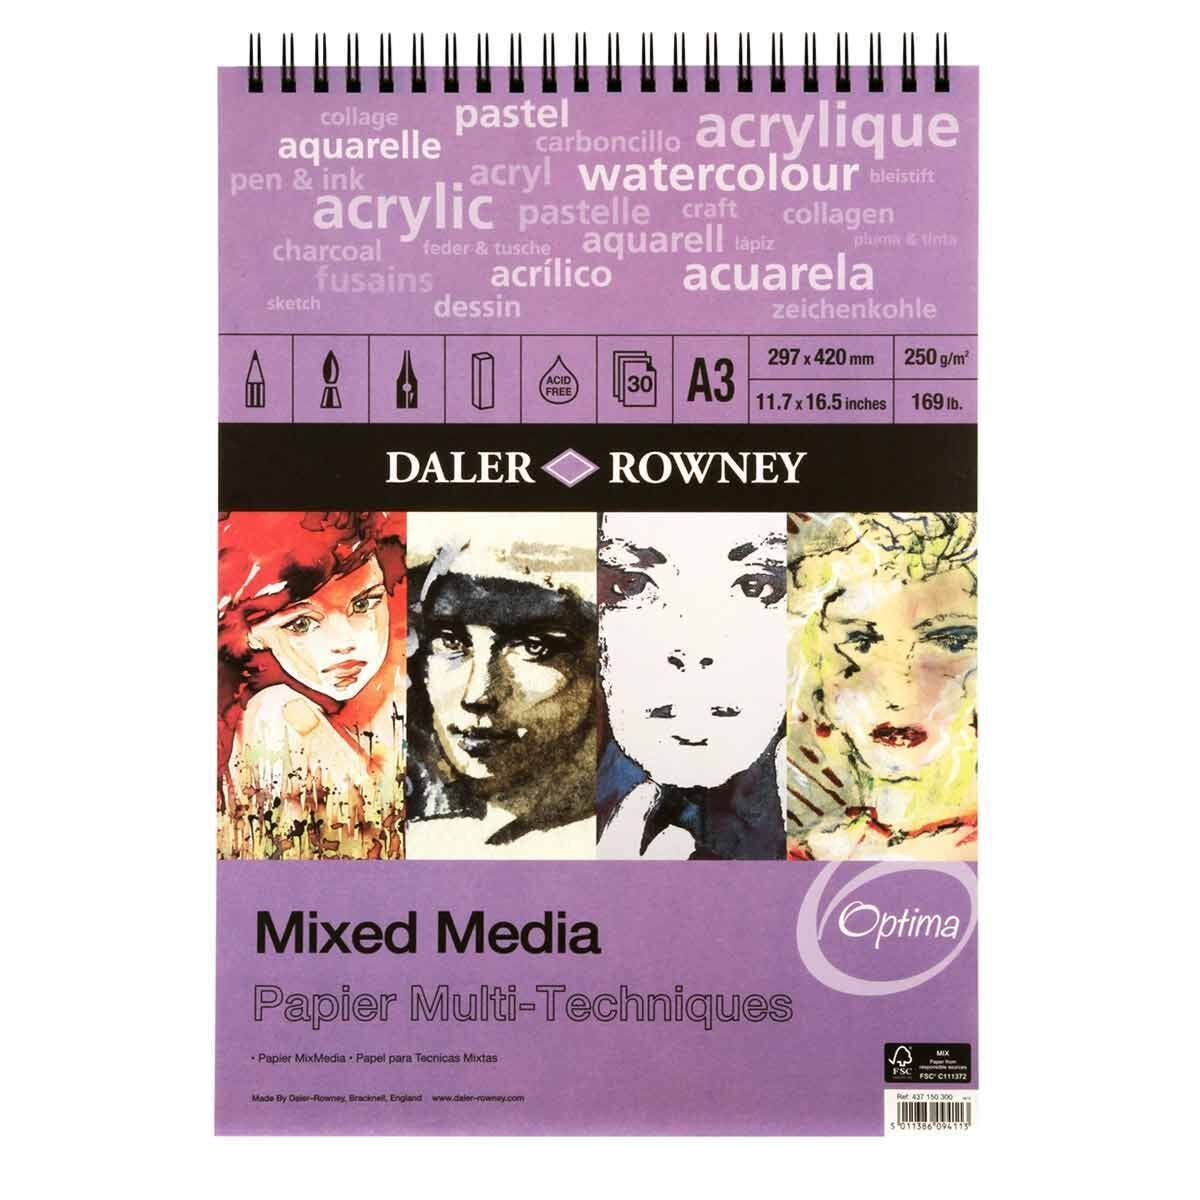 Daler Rowney Mixed Media Spiral Pad A3 30 Sheets White